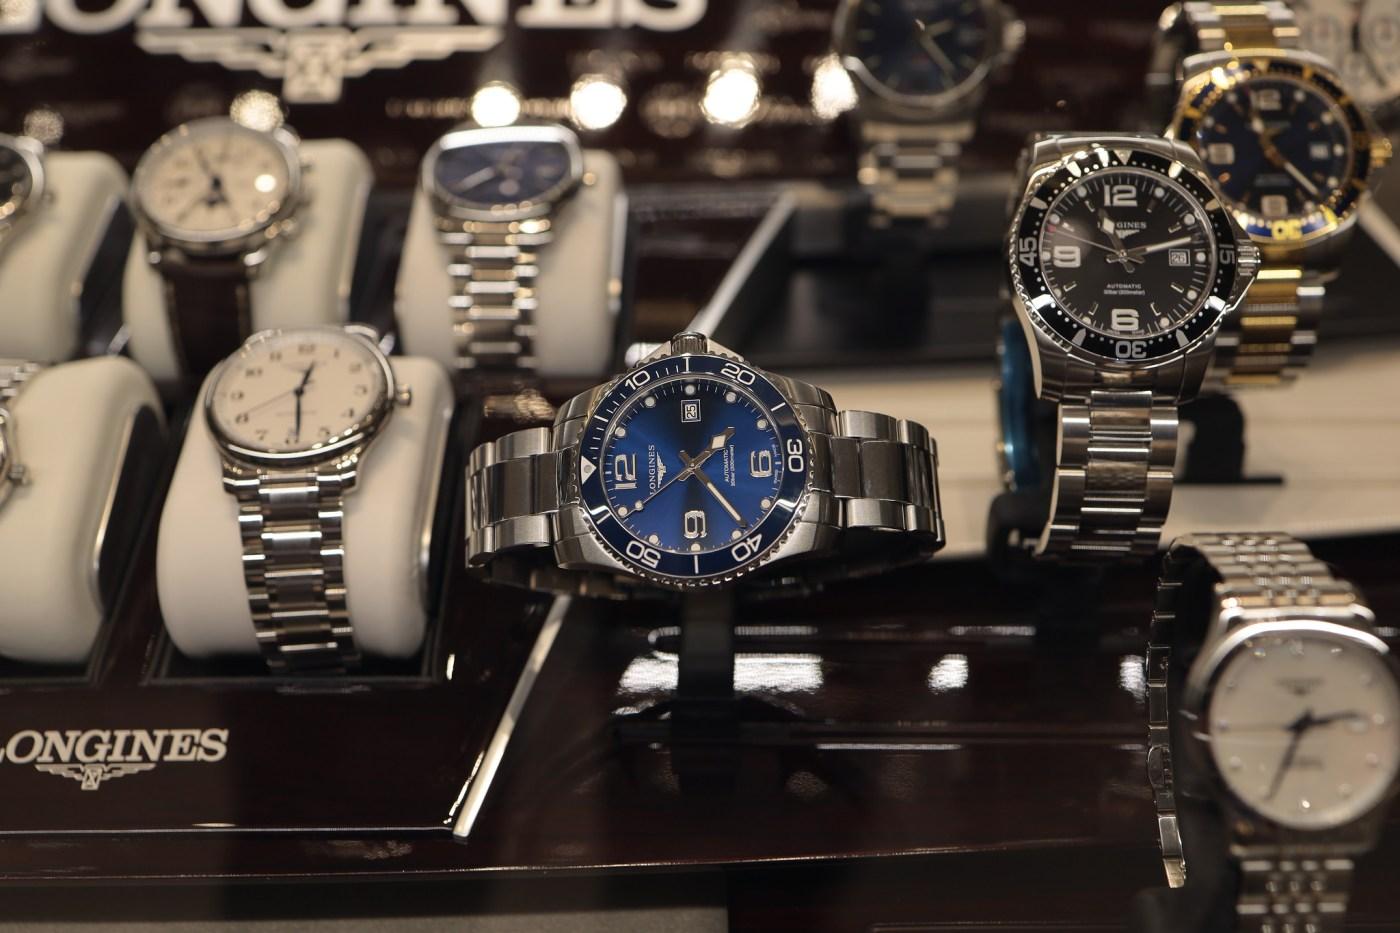 Longines display case Watches of Switzerland Hudson Yards 2019